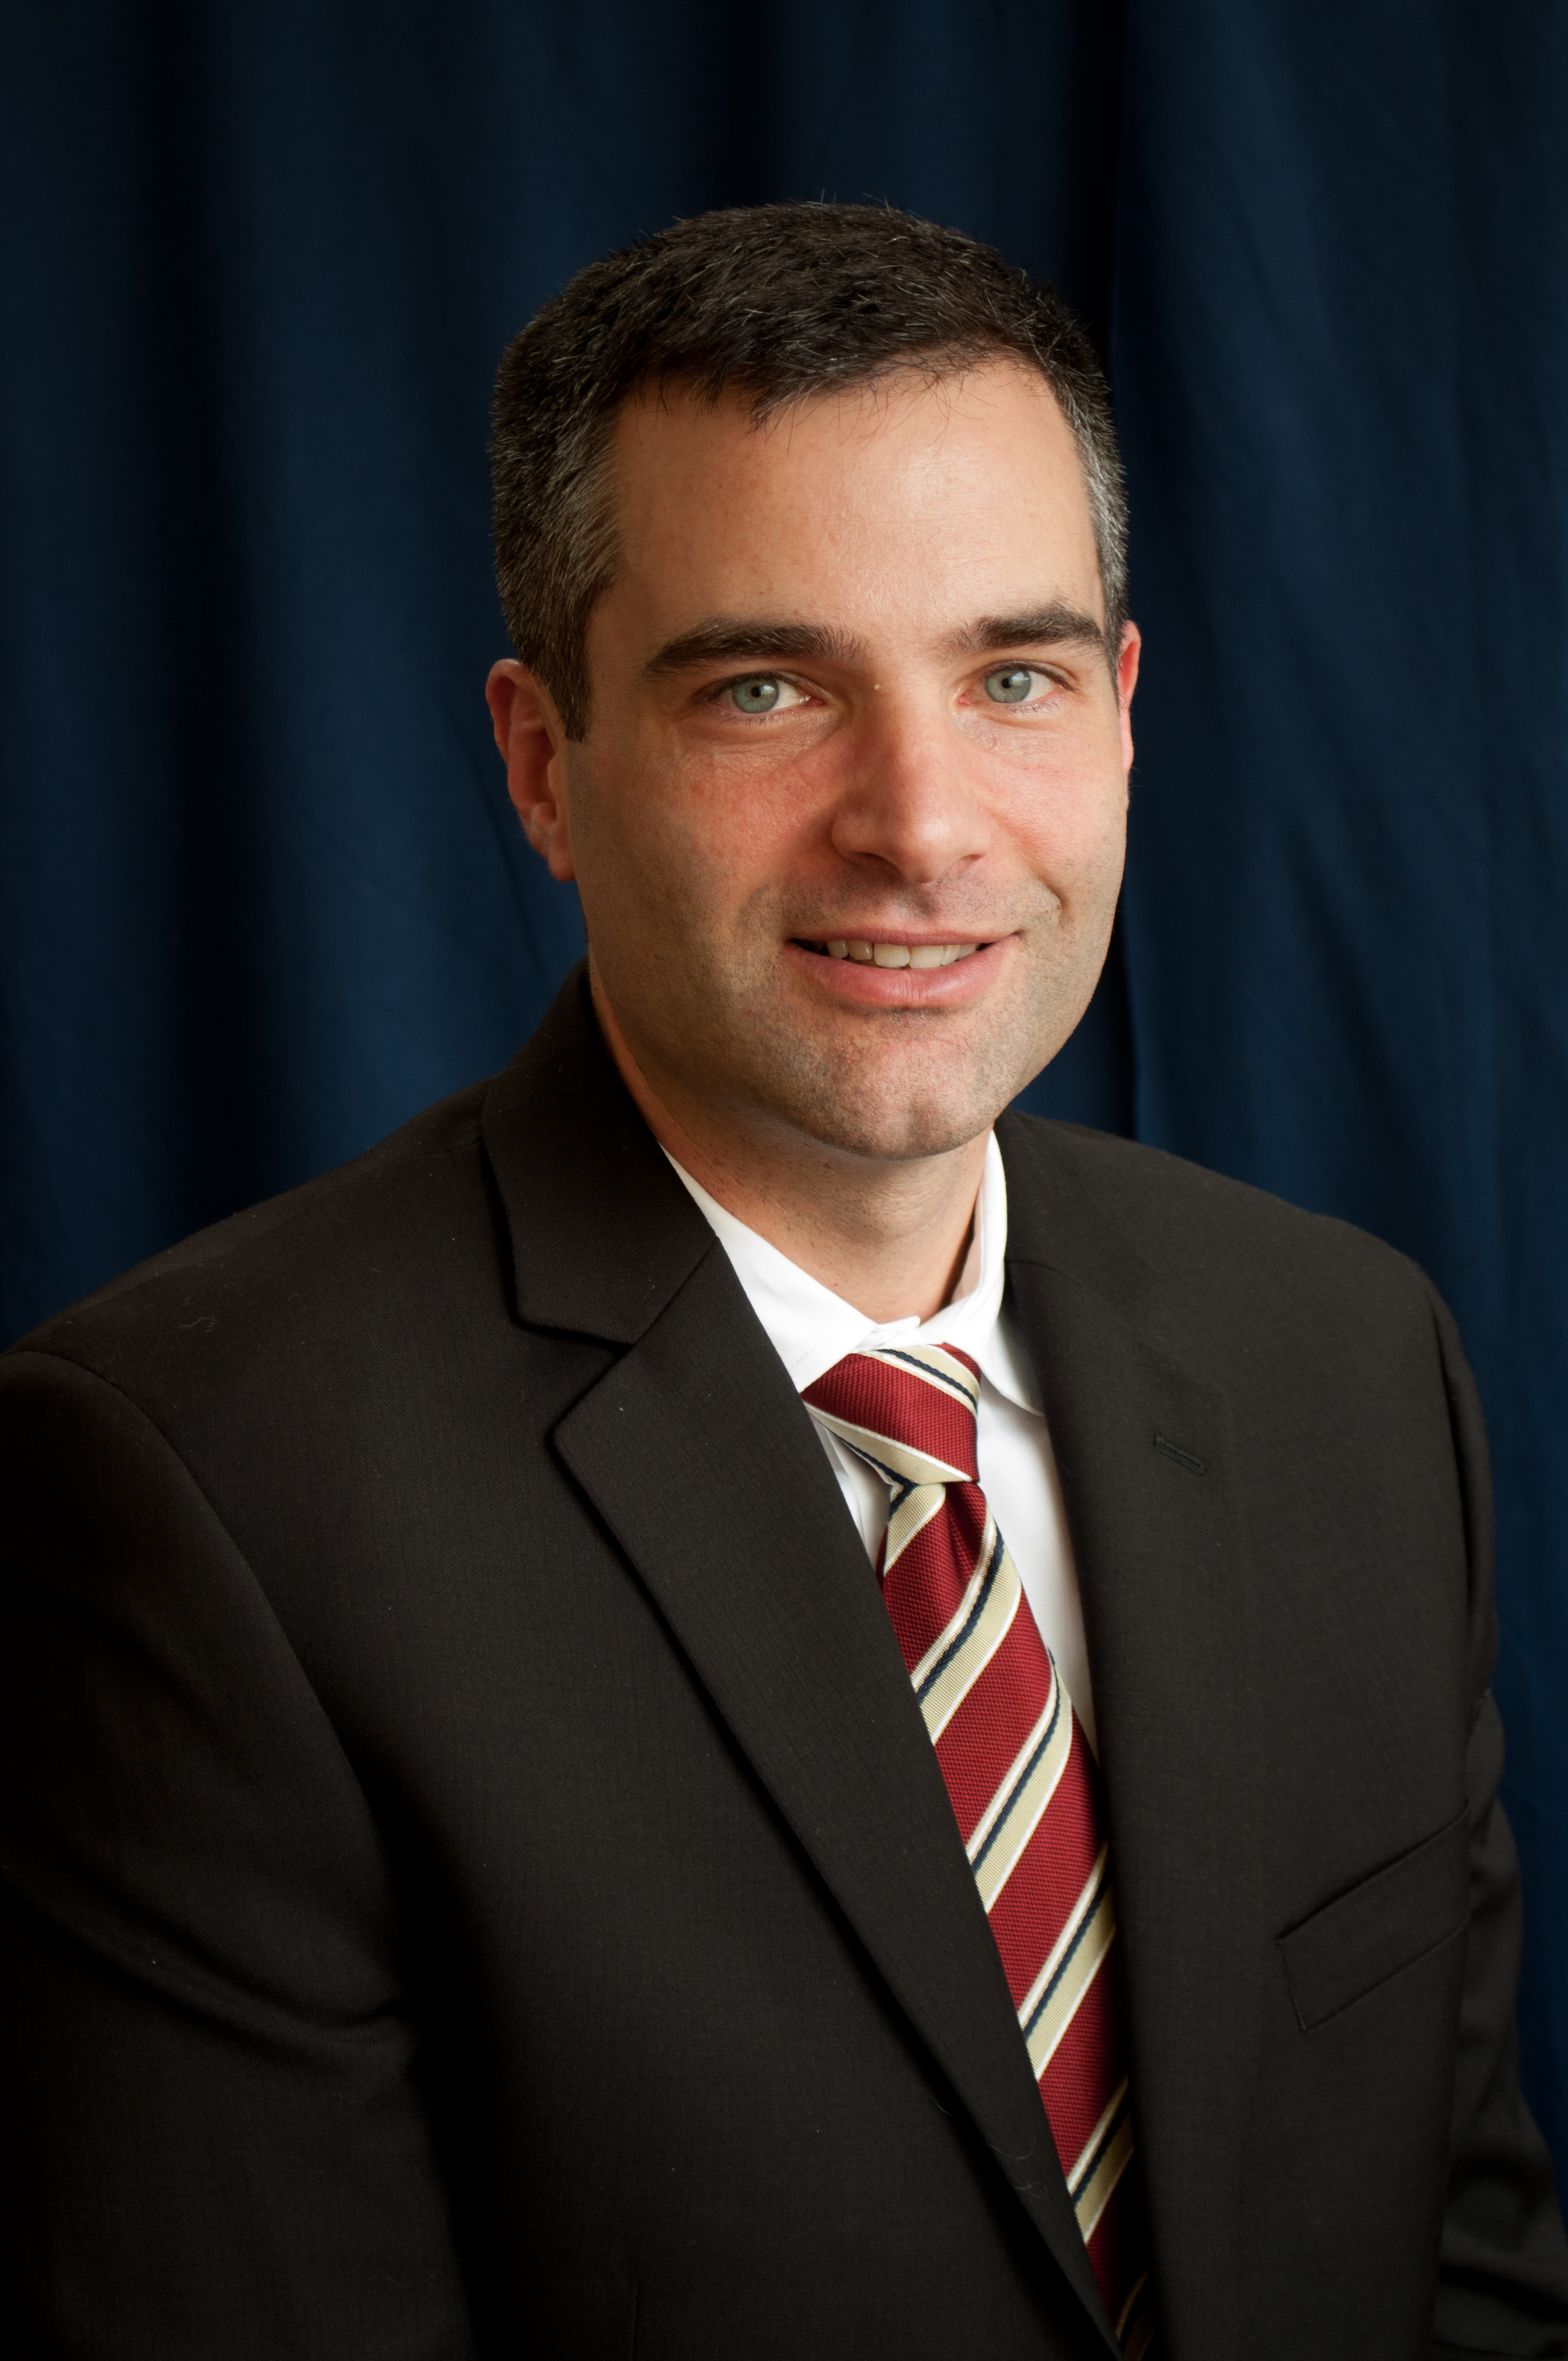 Stuart Lustgarten